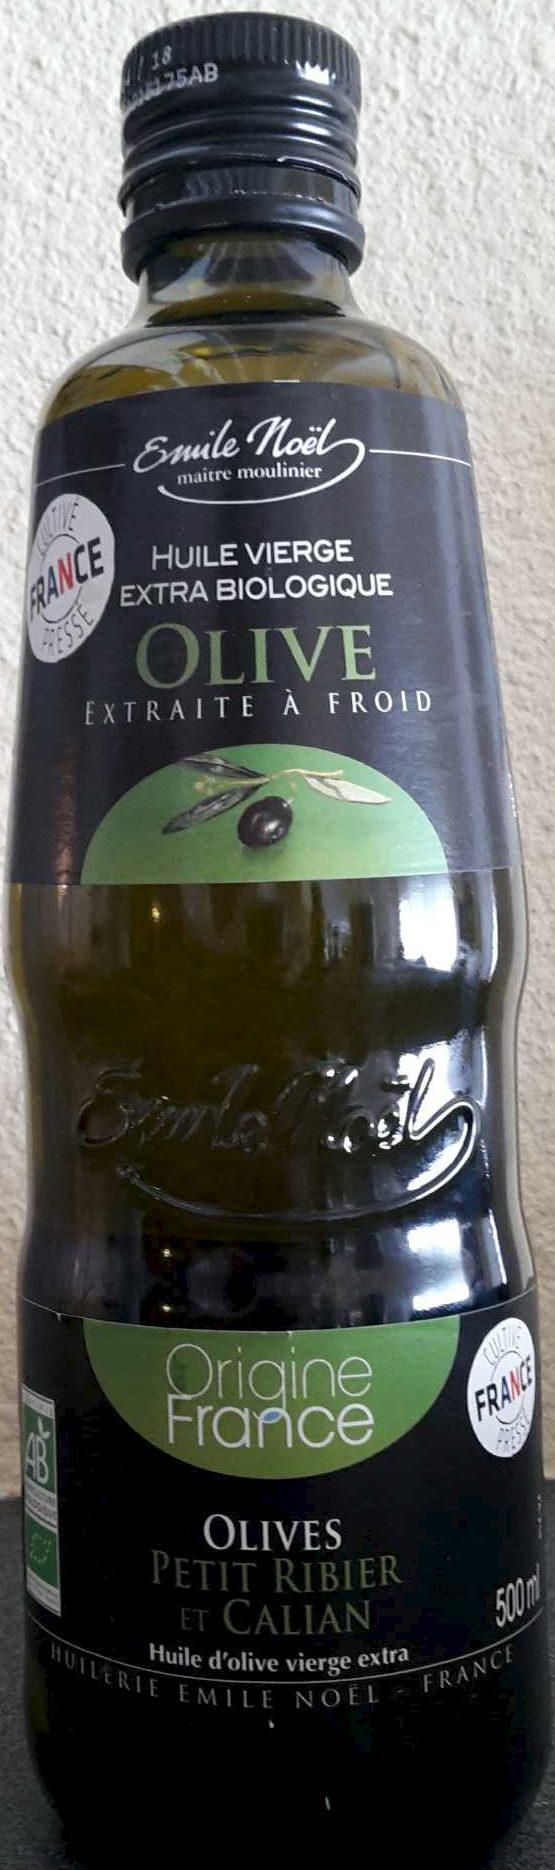 Huile vierge extra biologique olive - Produit - fr